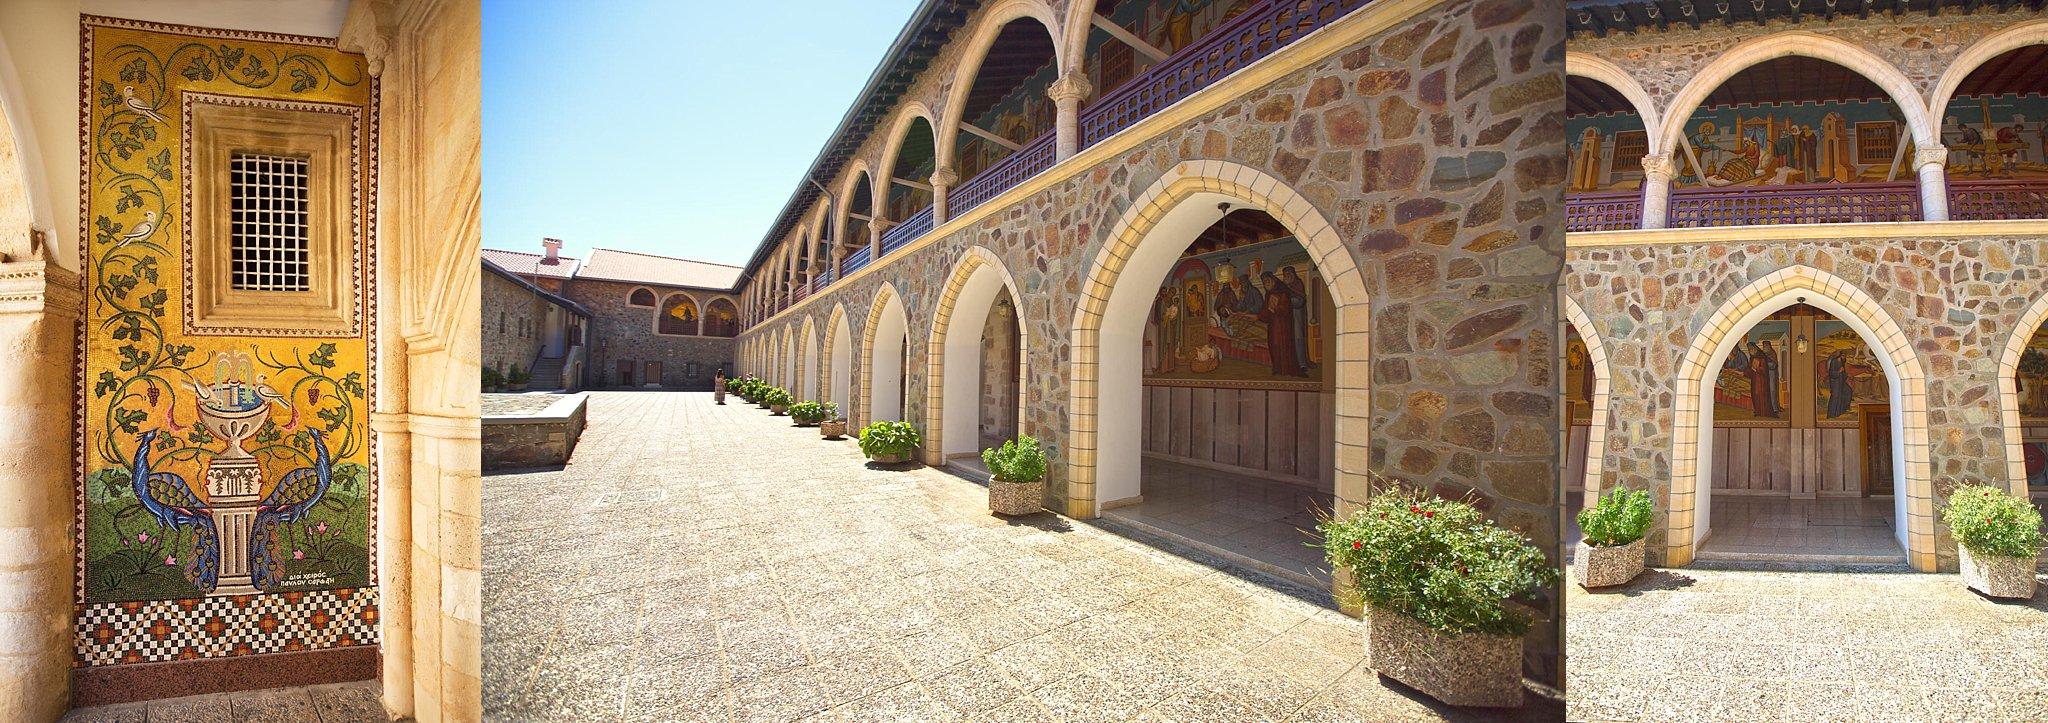 Kykkos Monastery in Cyrpus